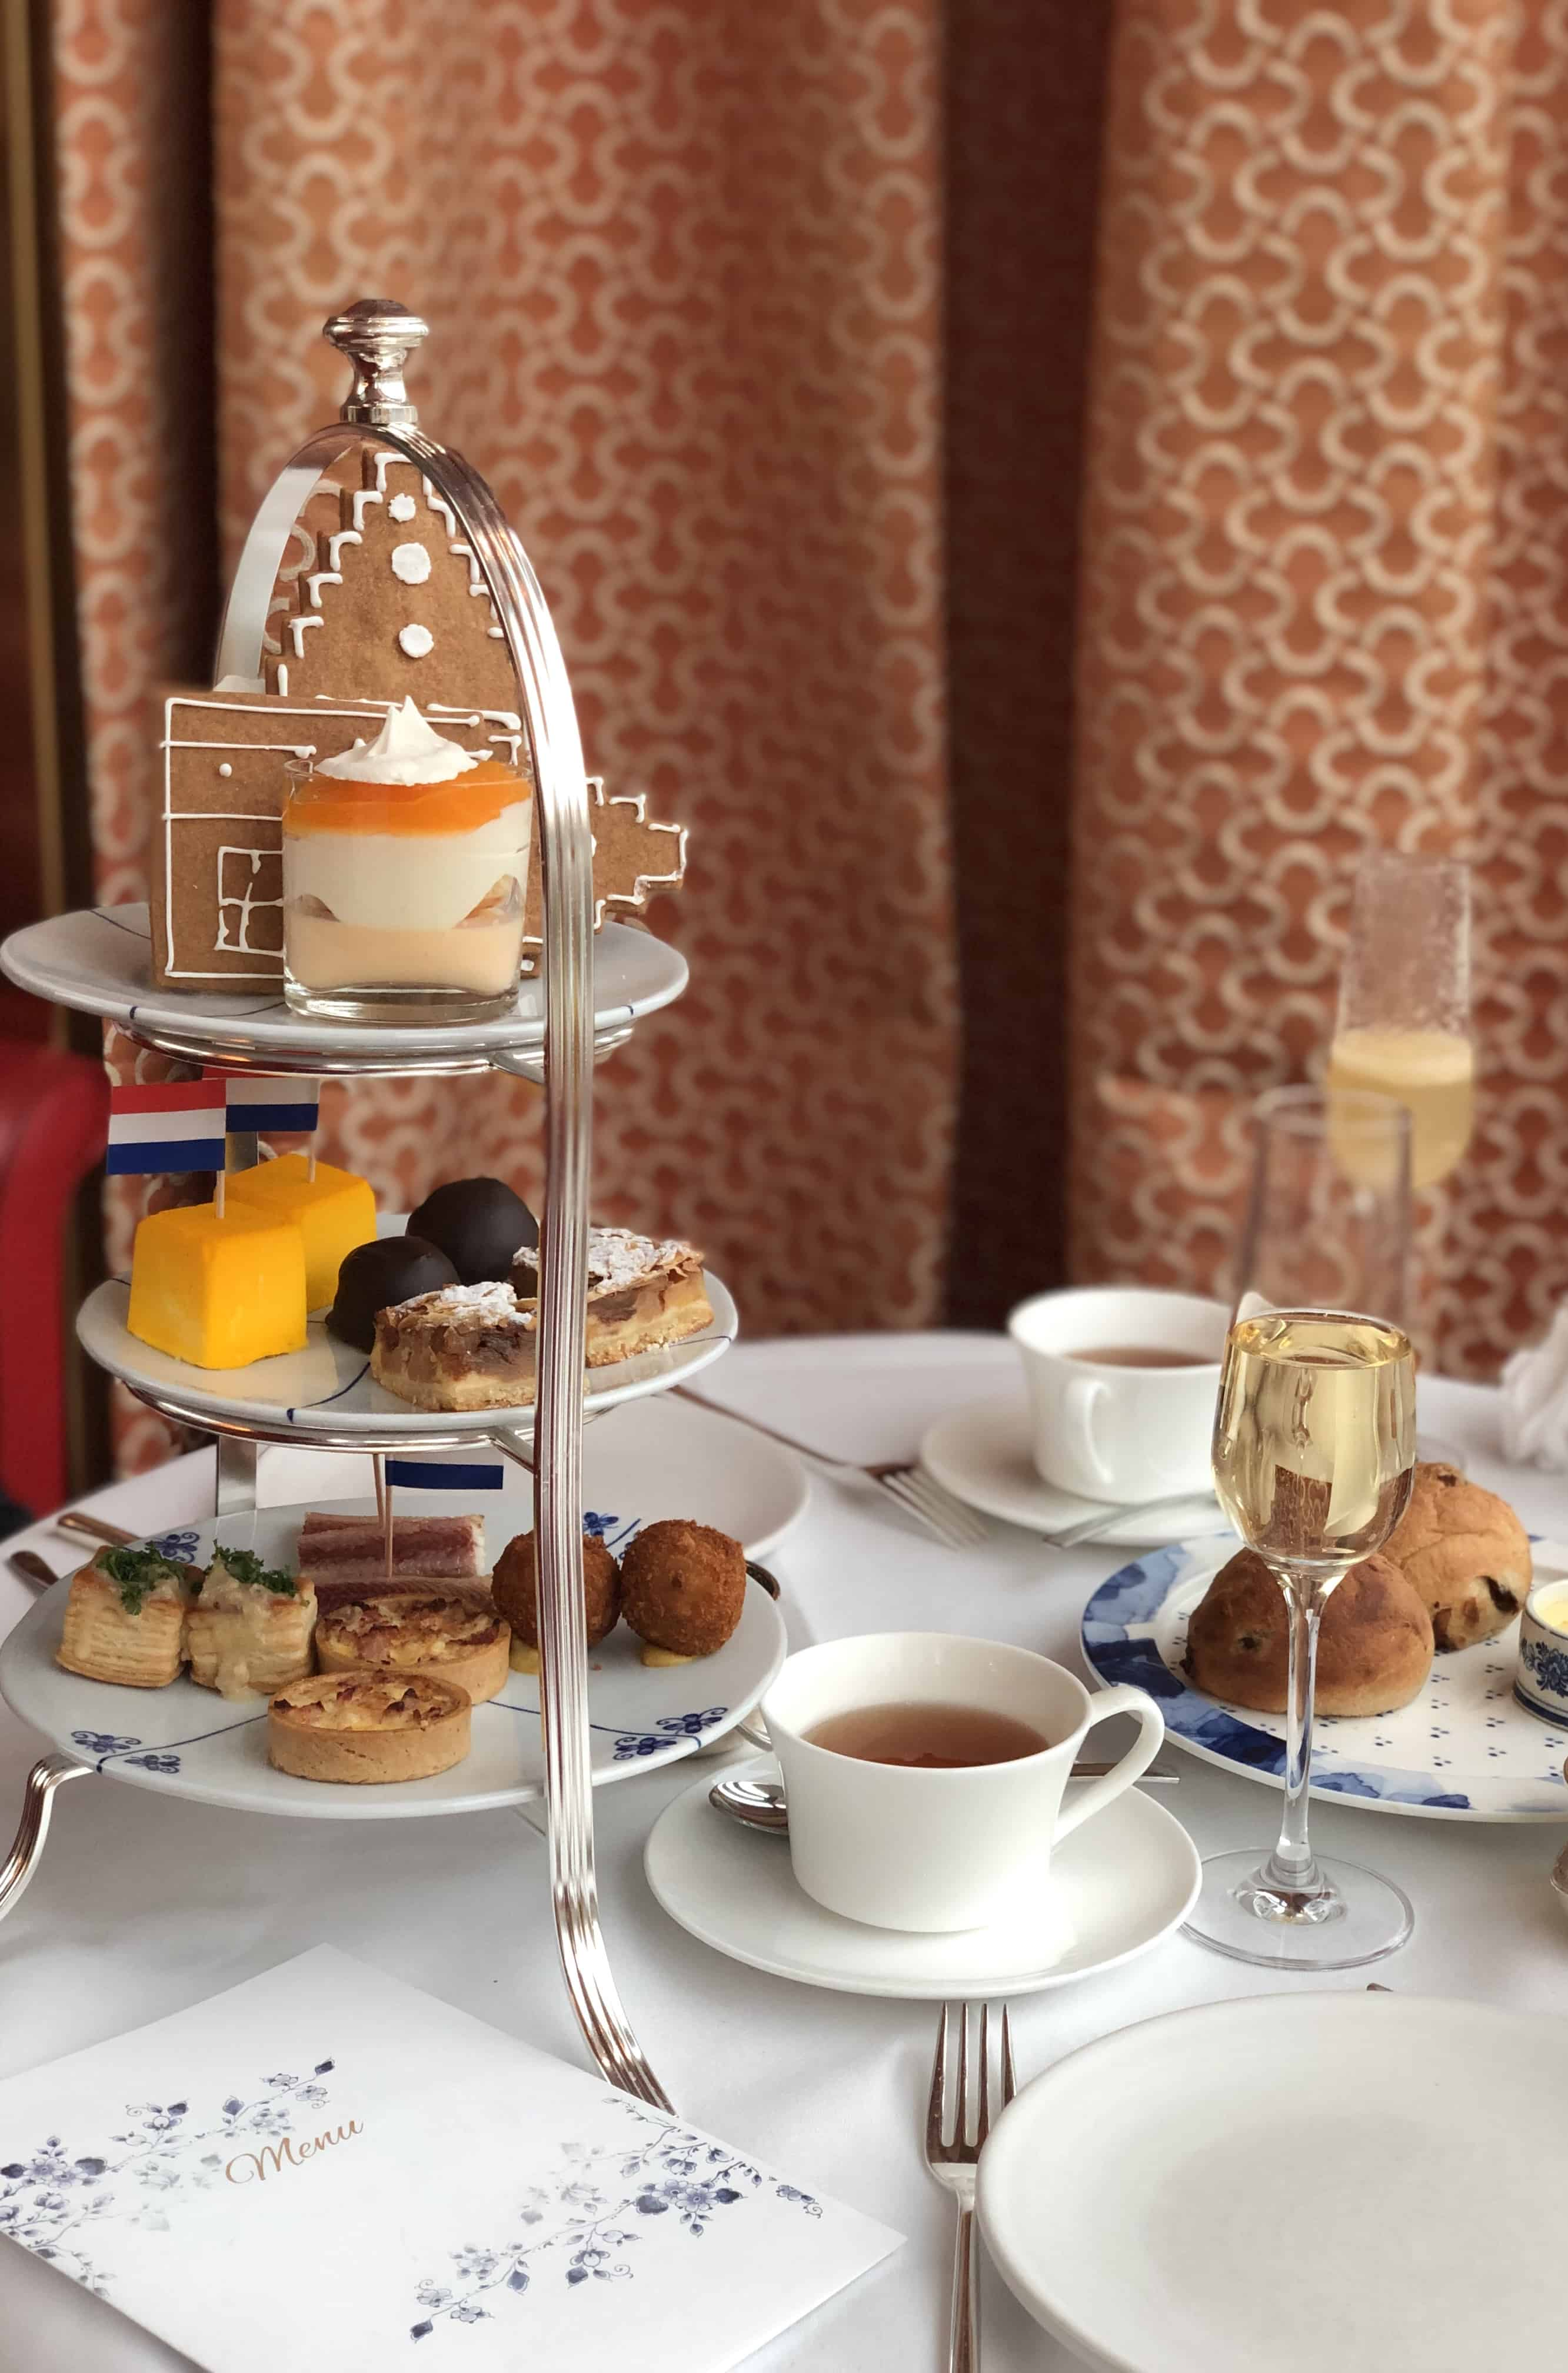 Things to do Amsterdam. Tips van de redactie. Culinaire uitjes Amsterdam. Afternoon Tea